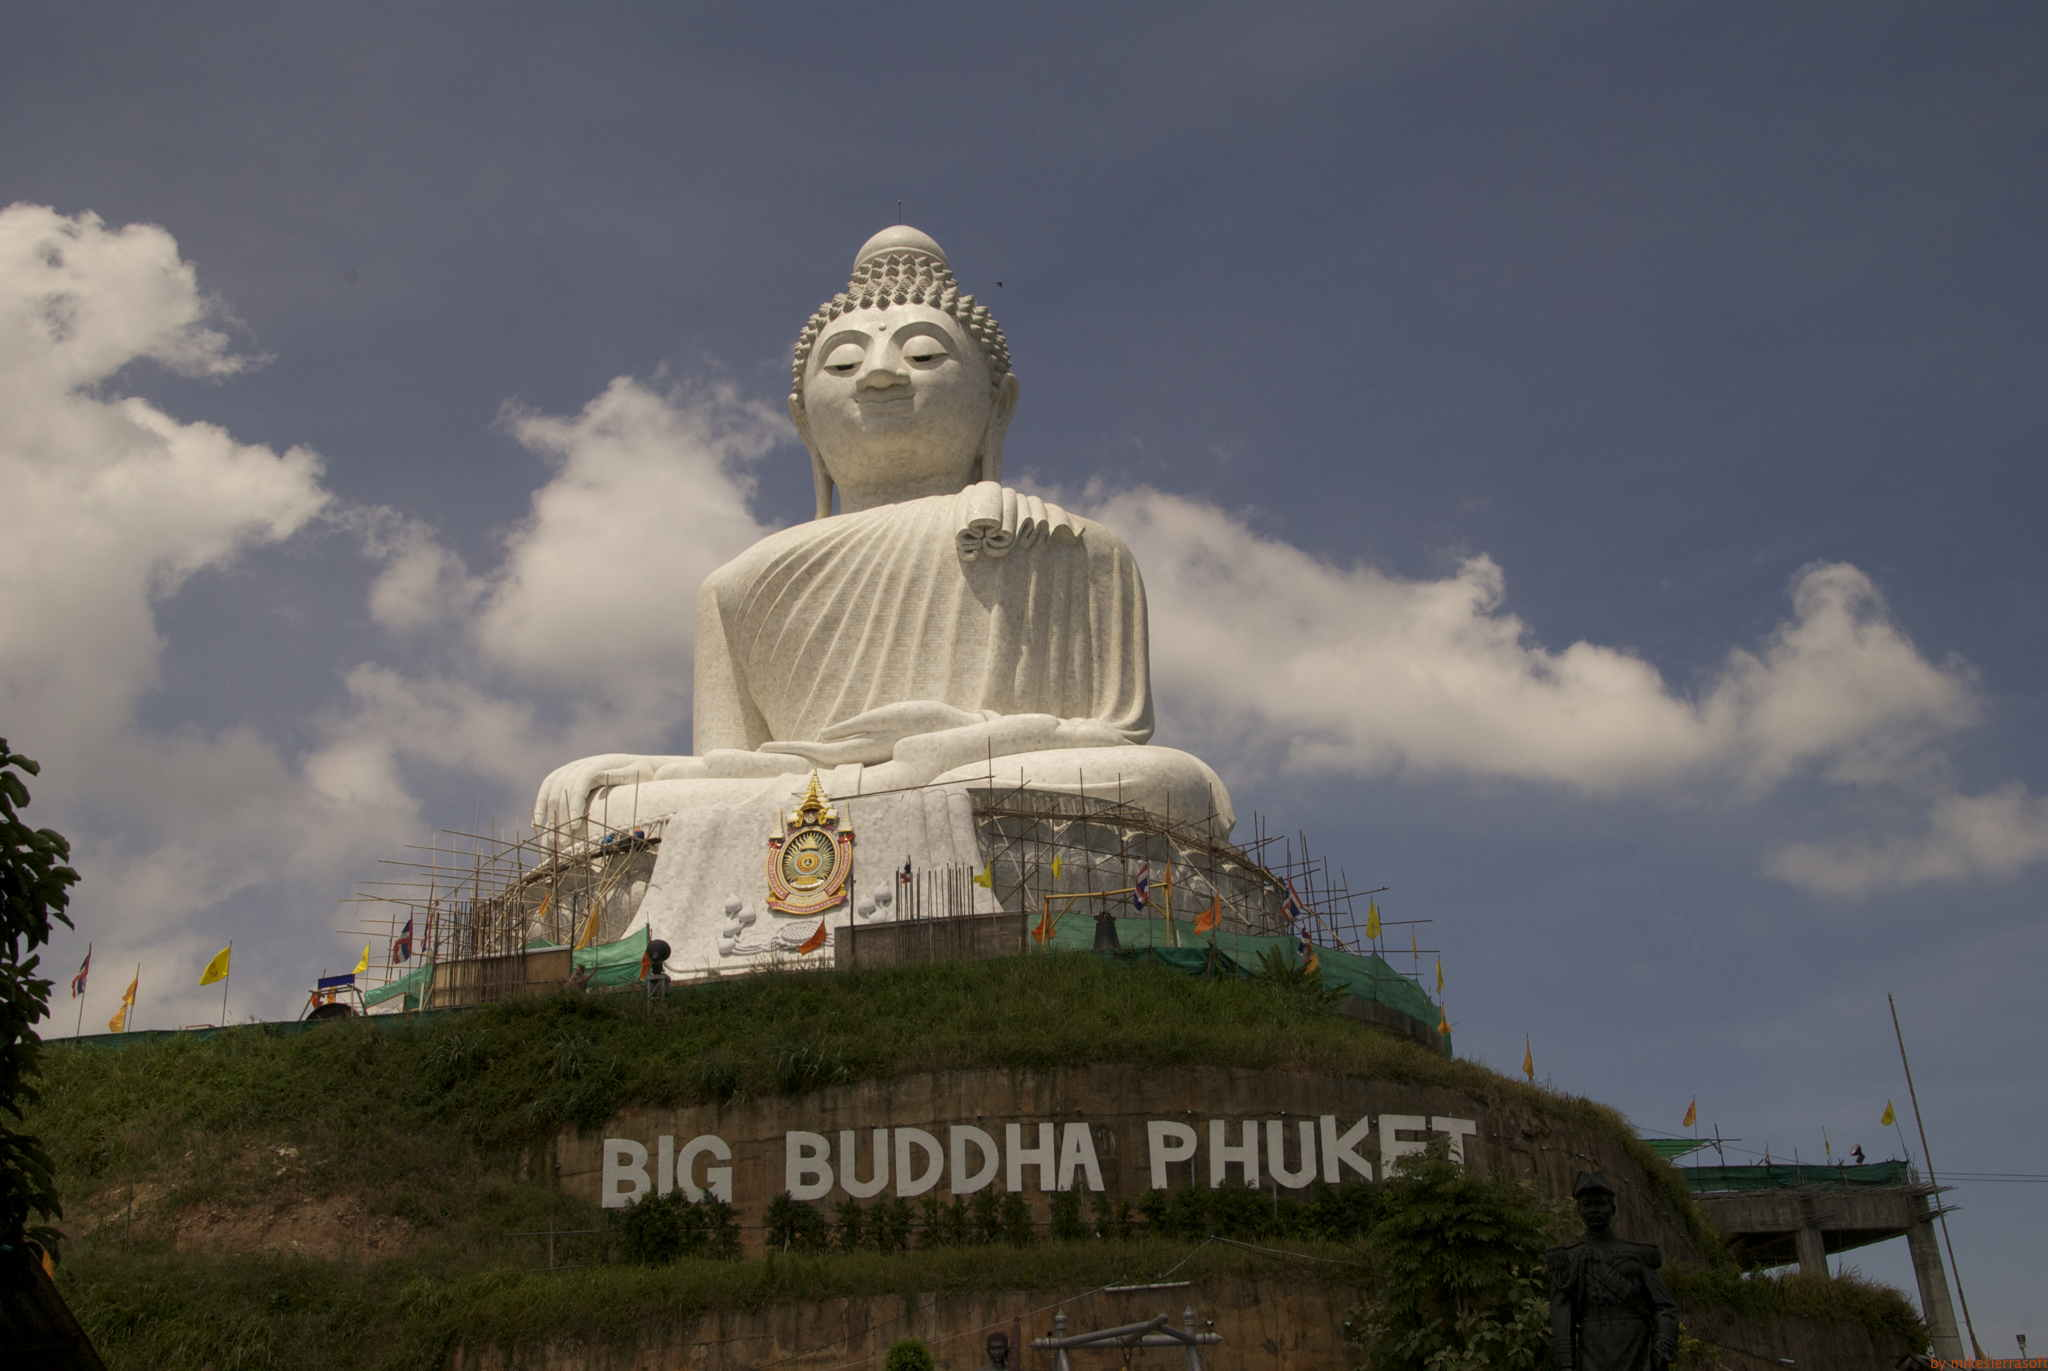 Tour of Phuket